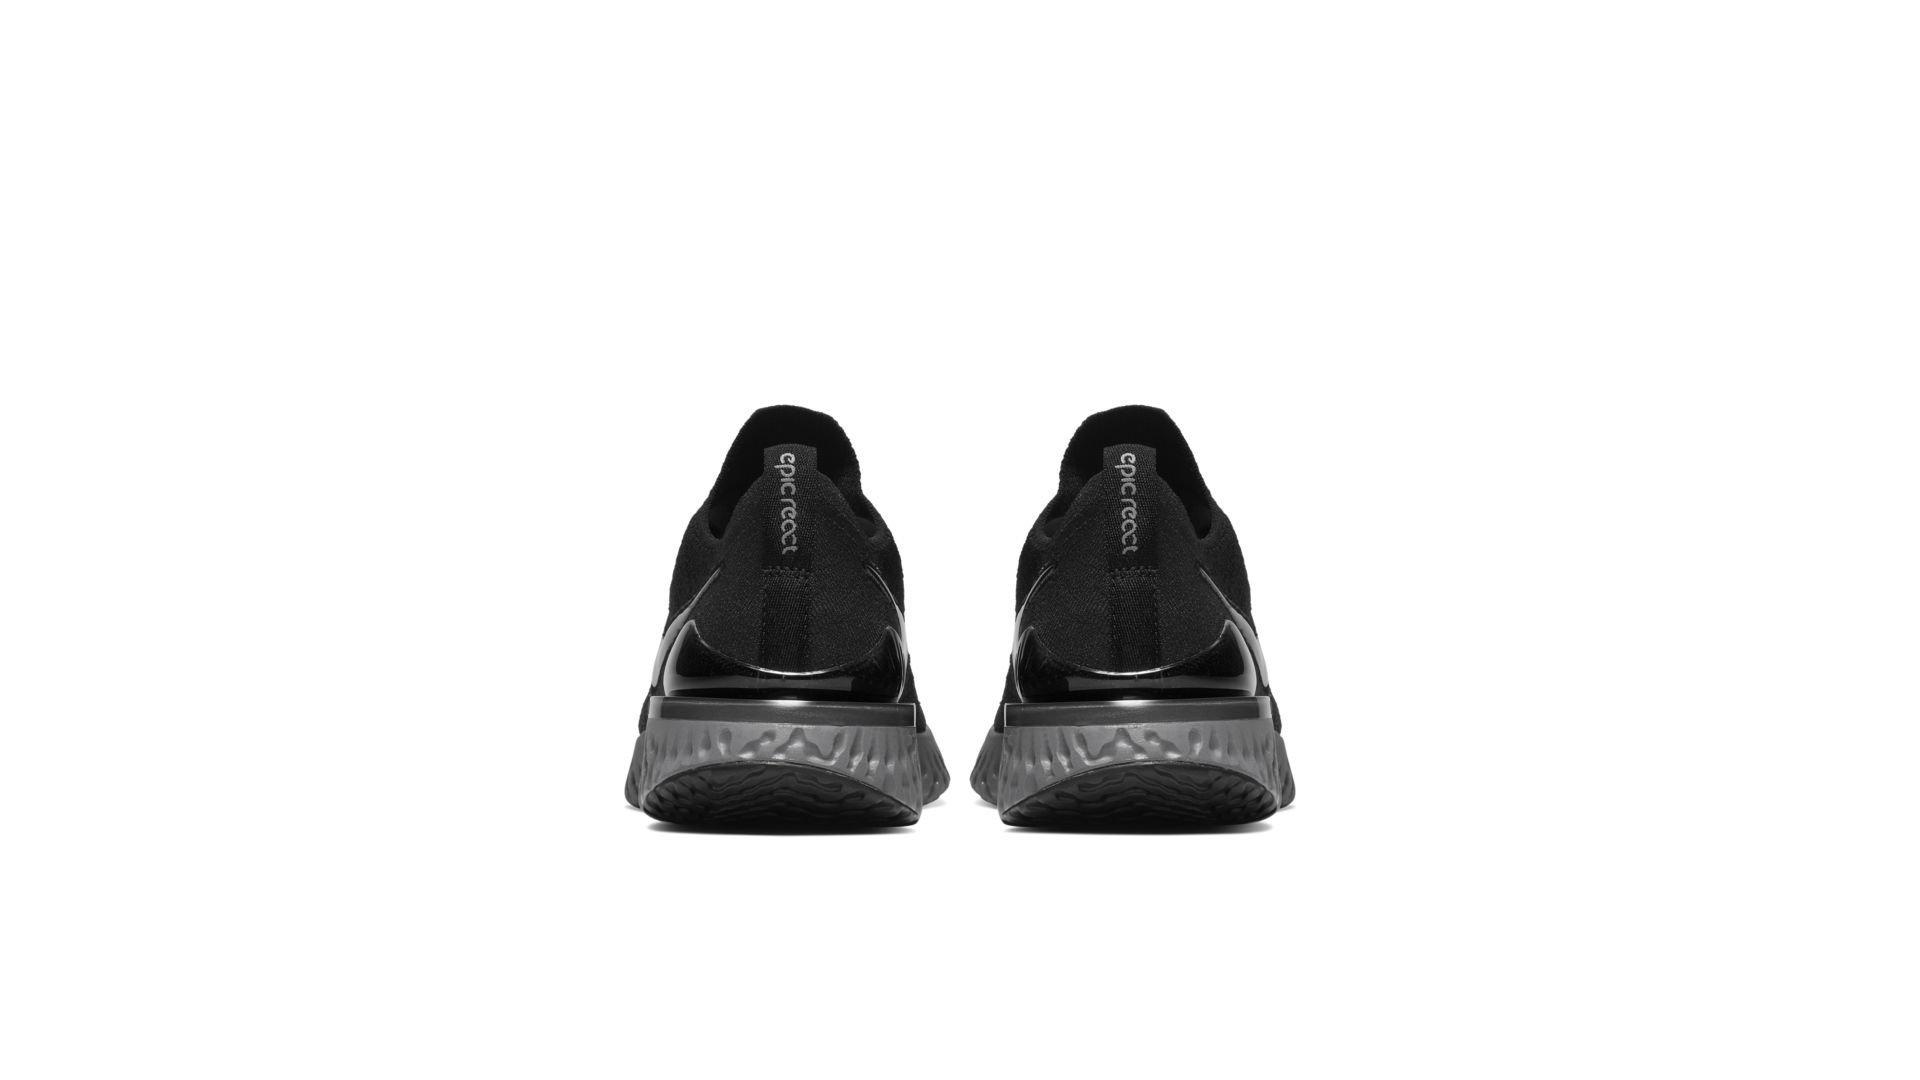 Nike Epic React Flyknit 2 Black Anthracite (W) (BQ8927-001)